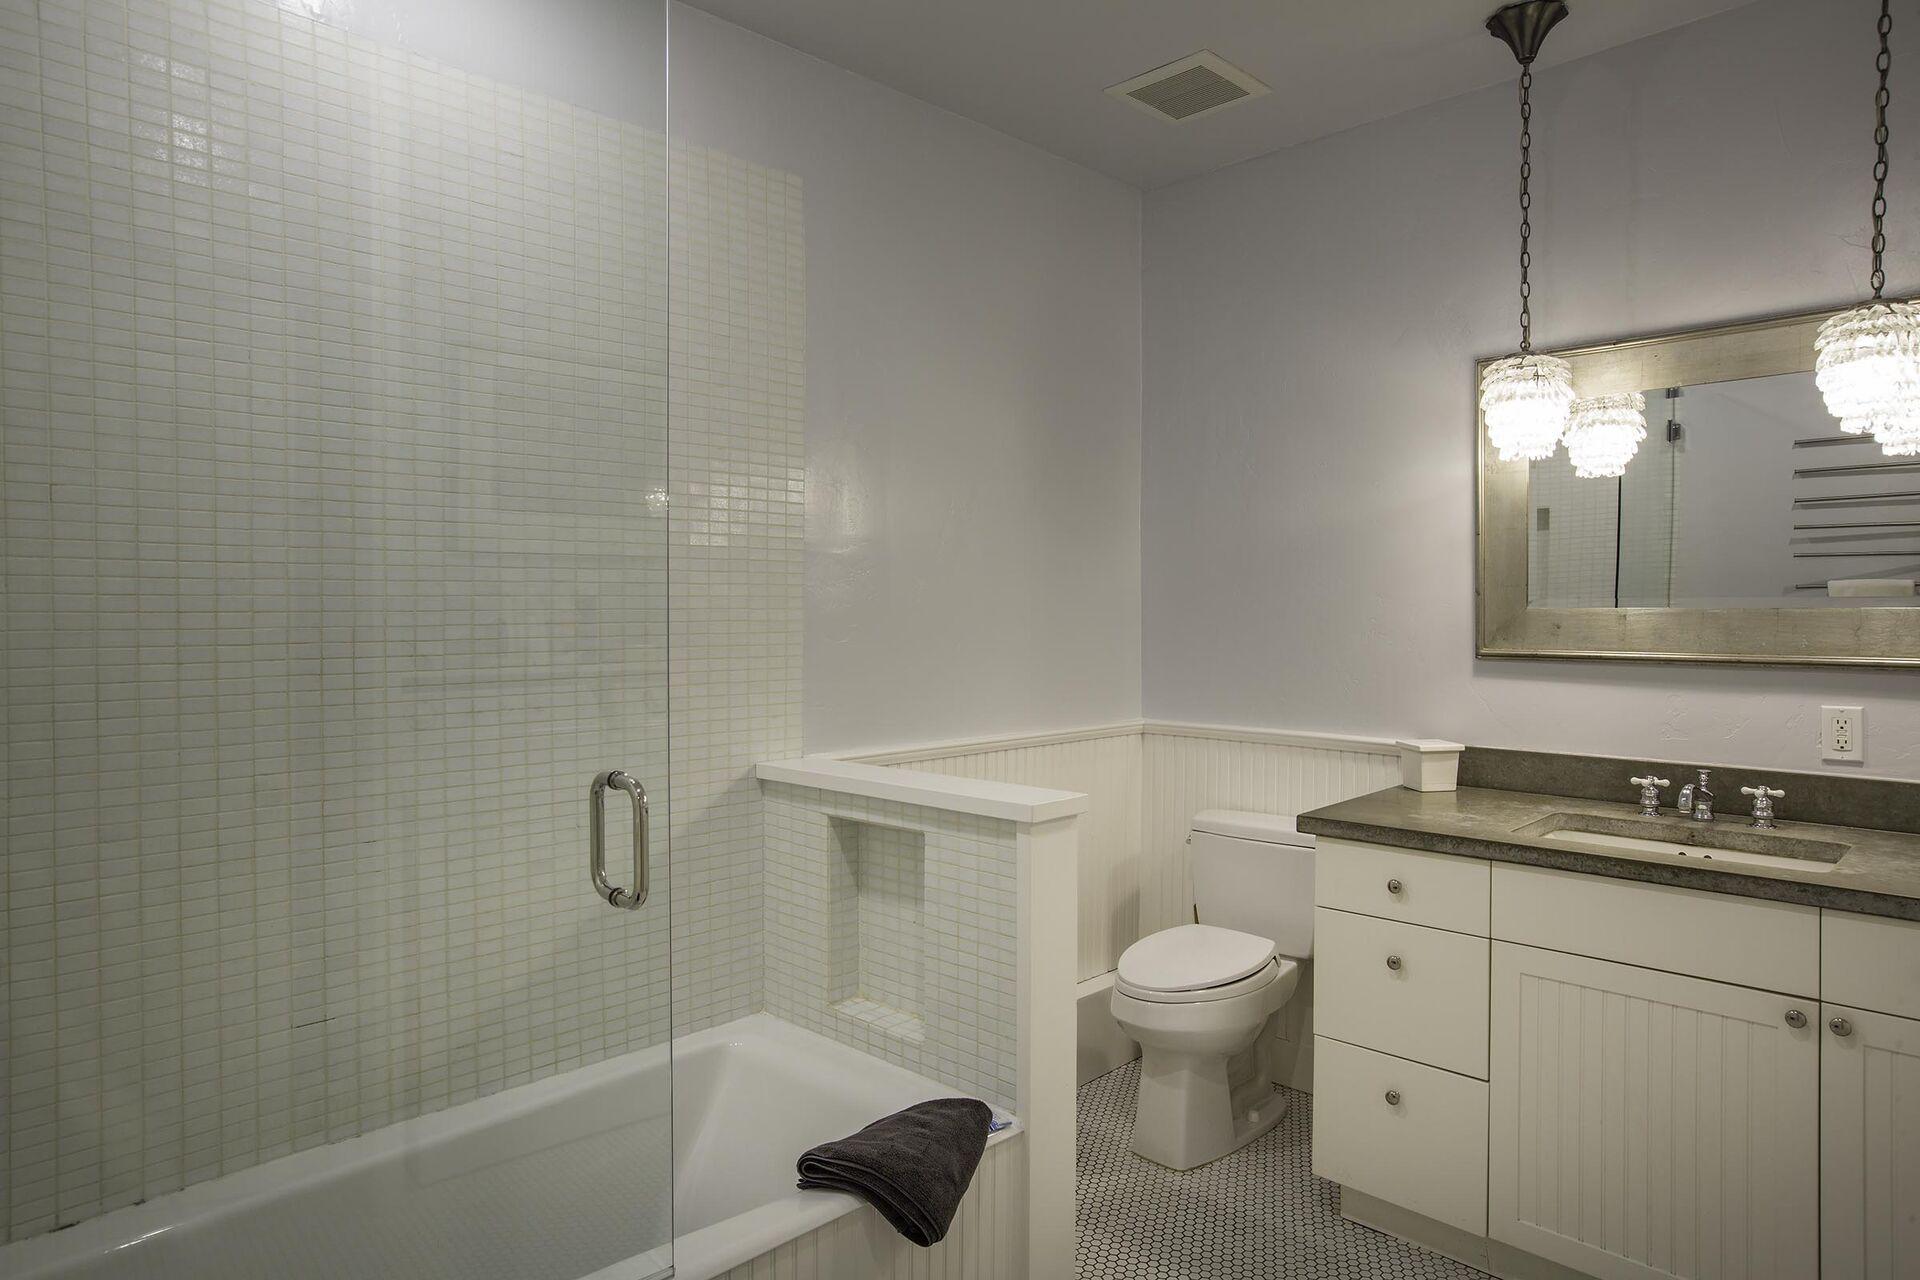 A bath tub, a toilet and a sink